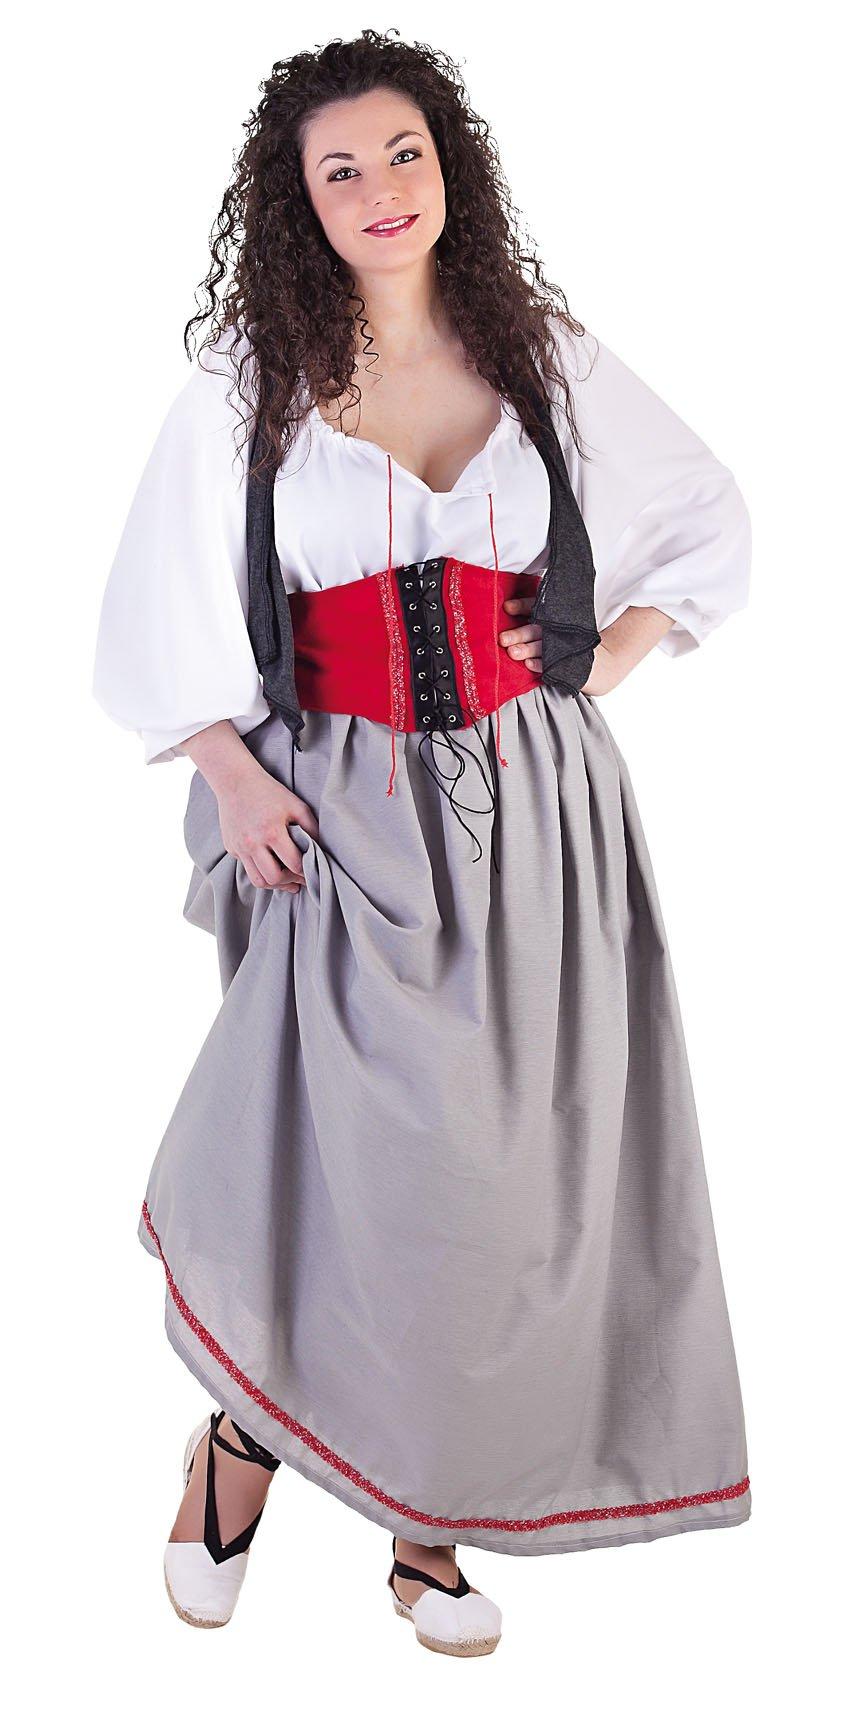 Disfraz de hortelana mujer